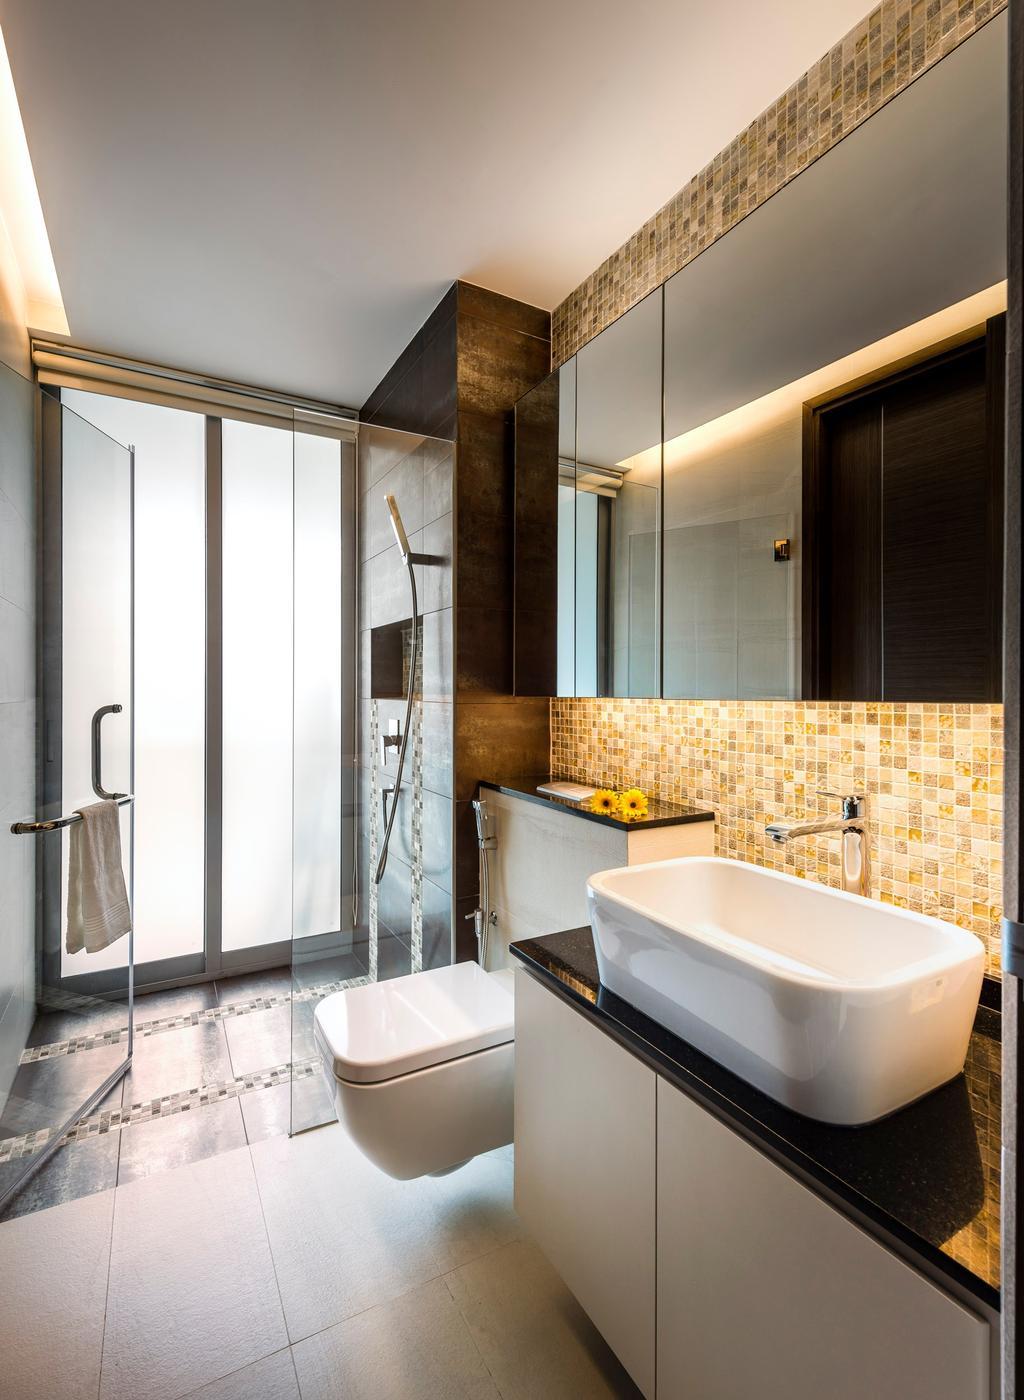 Traditional, Condo, Bathroom, Meyer, Interior Designer, Space Vision Design, Wall Mount Toilet Bowl, White, Sink, Basin, Indoors, Interior Design, Room